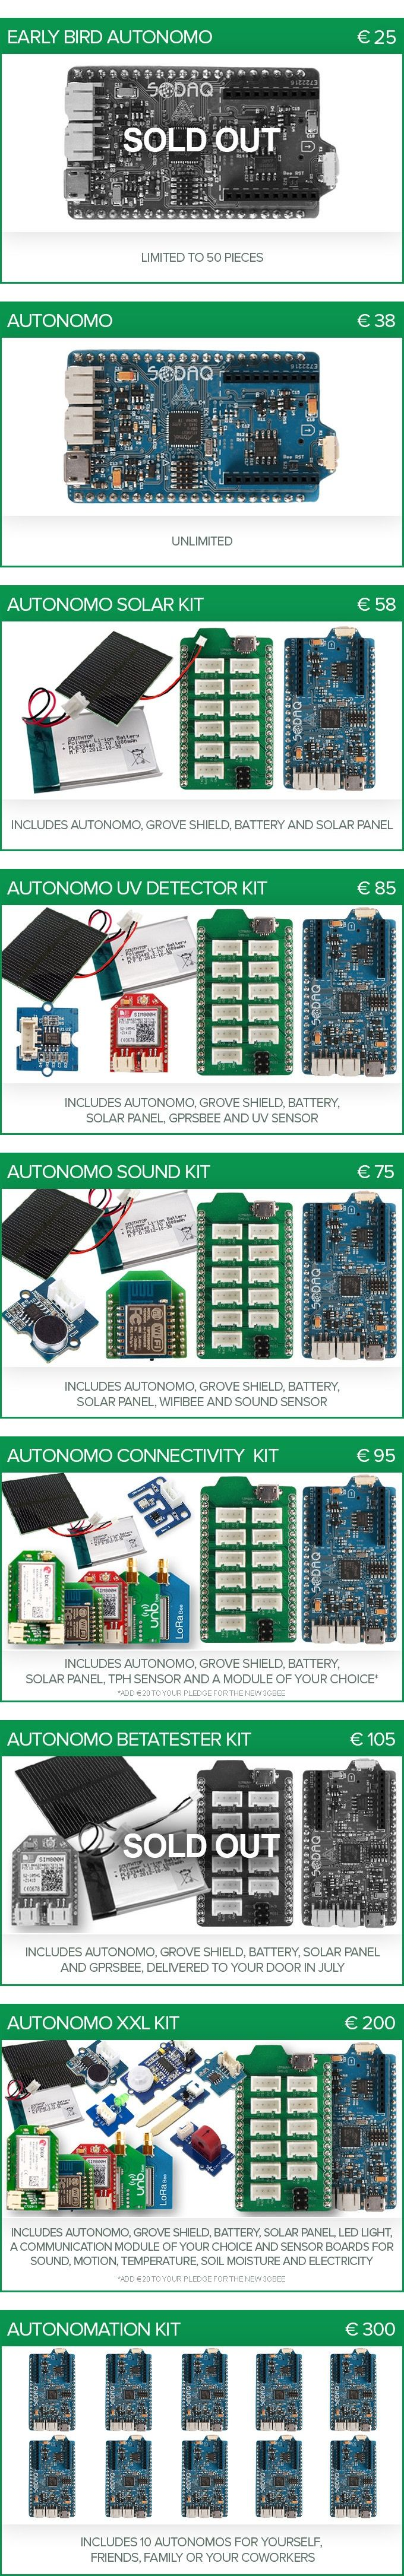 Autonomo: The Solar-Powered Thing! by SODAQ — Kickstarter